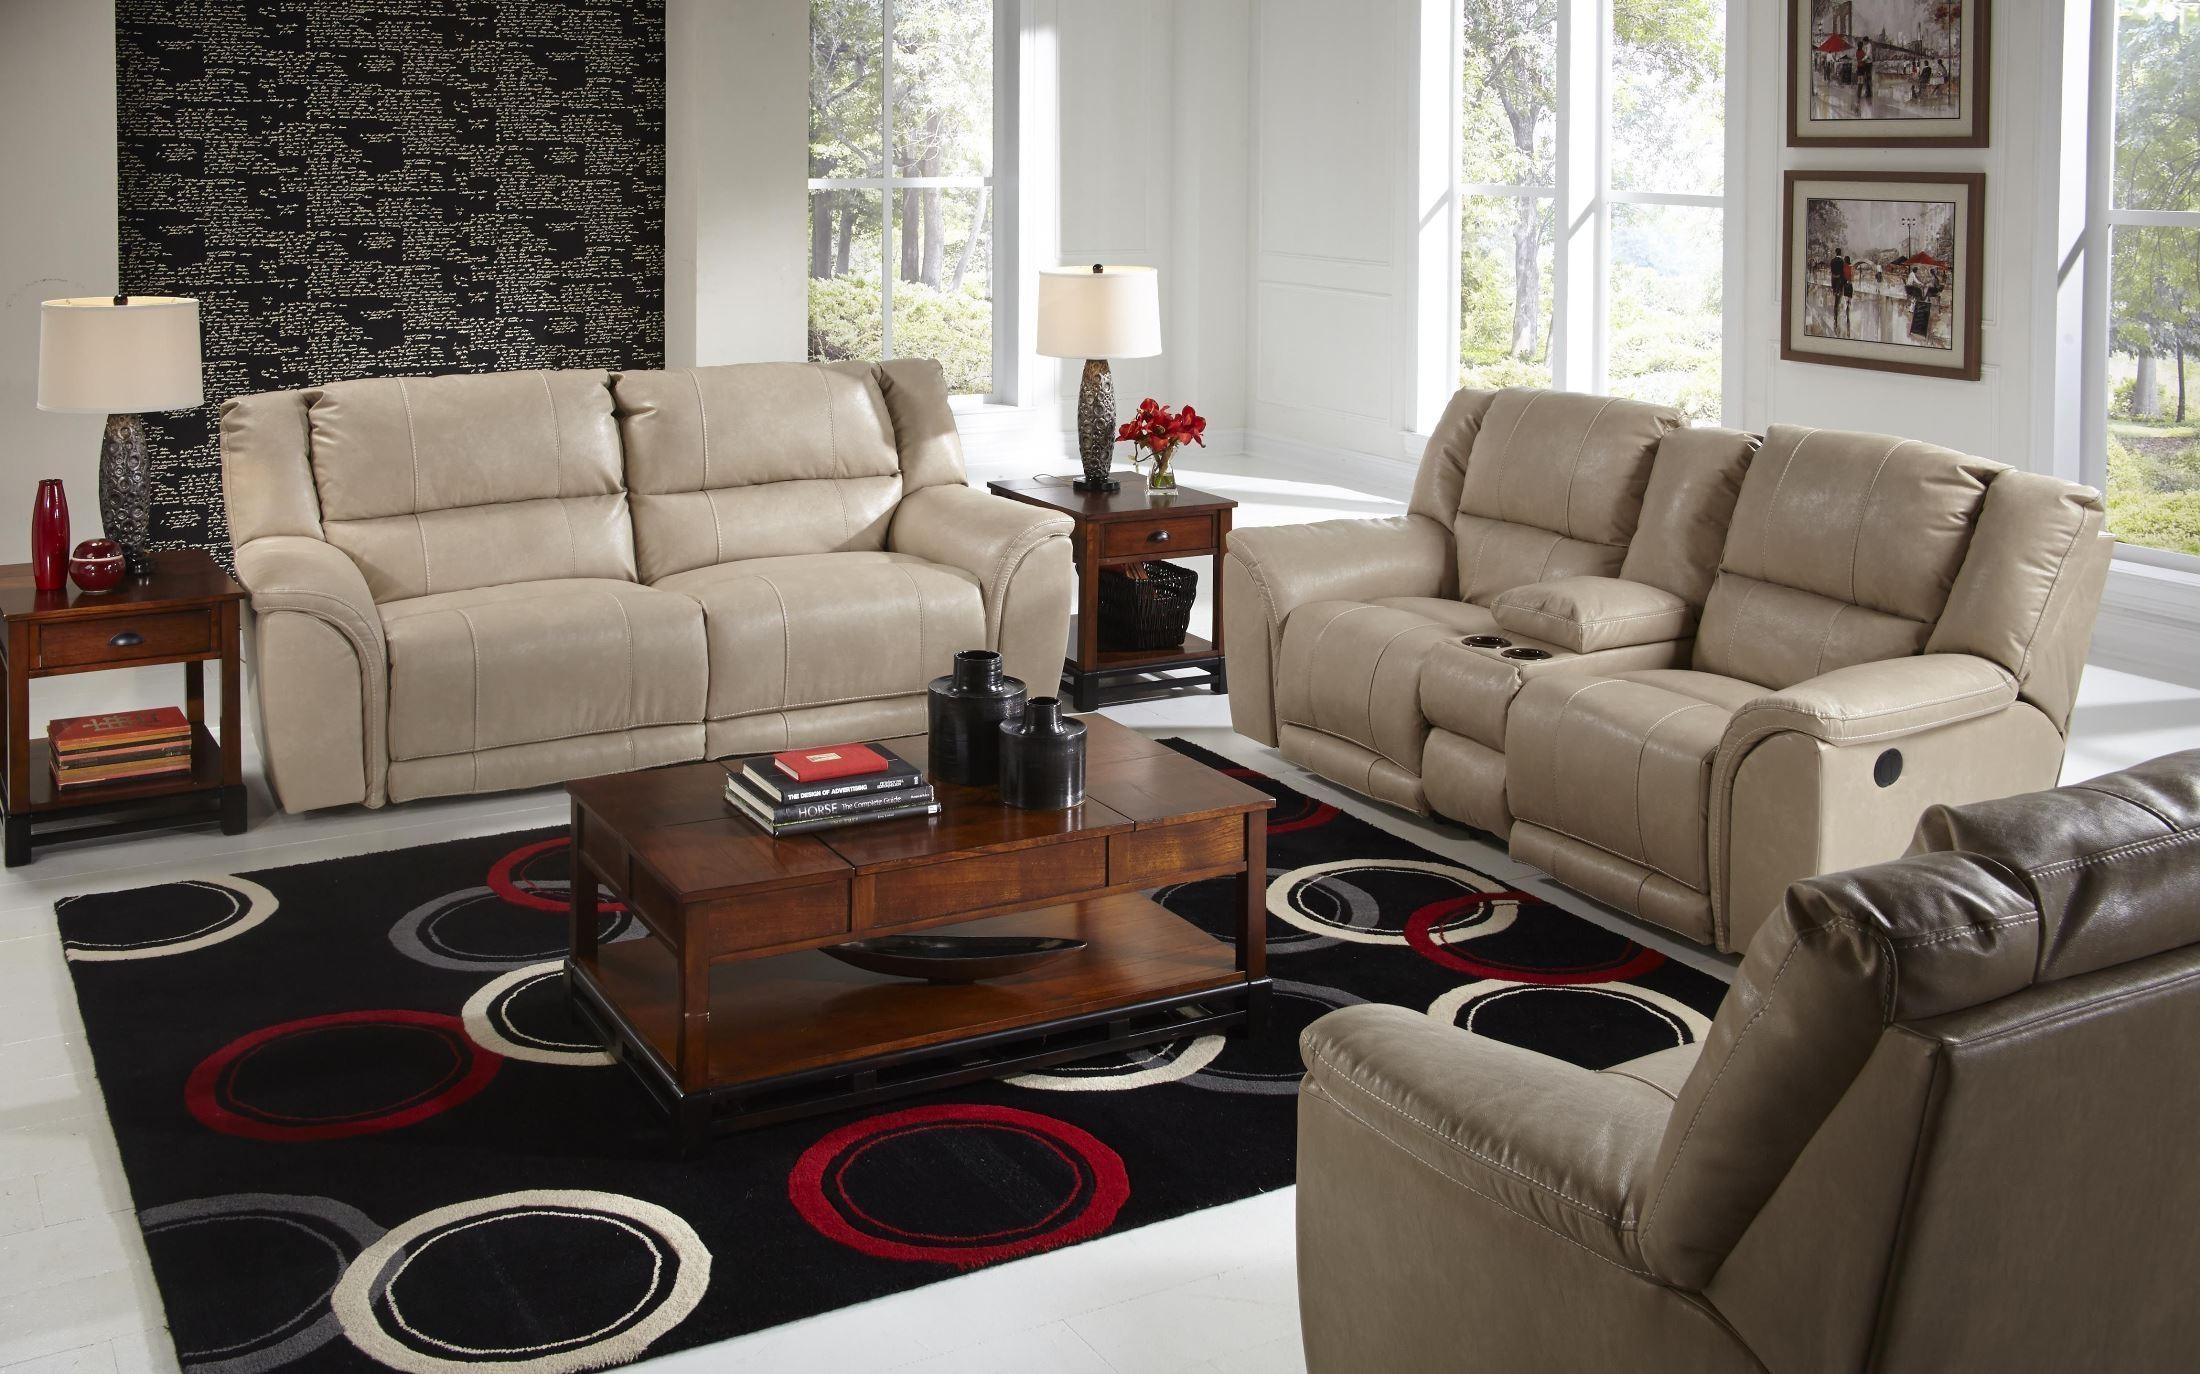 Carmine Pebble Power Reclining Living Room Set From Catnapper Regarding Catnapper Reclining Sofas (View 4 of 20)